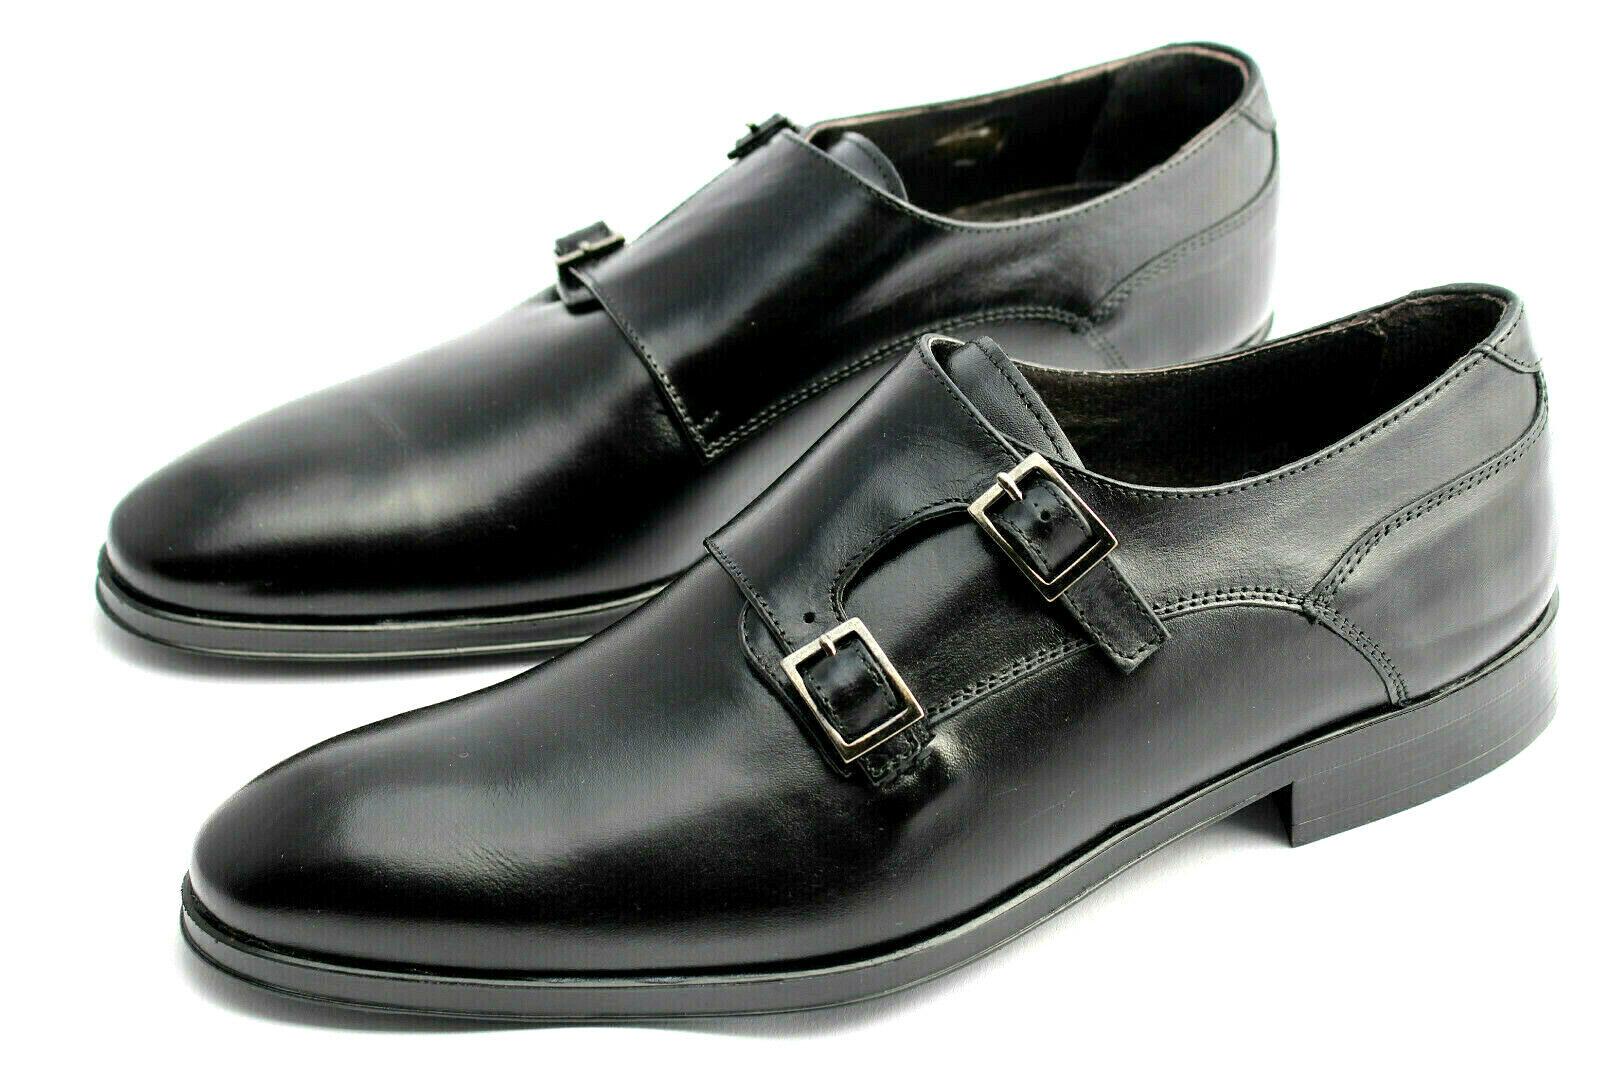 Herren Leder Halbschuhe schwarz Anzugschuhe Schnallen Leather schuhe 42 43 44 45